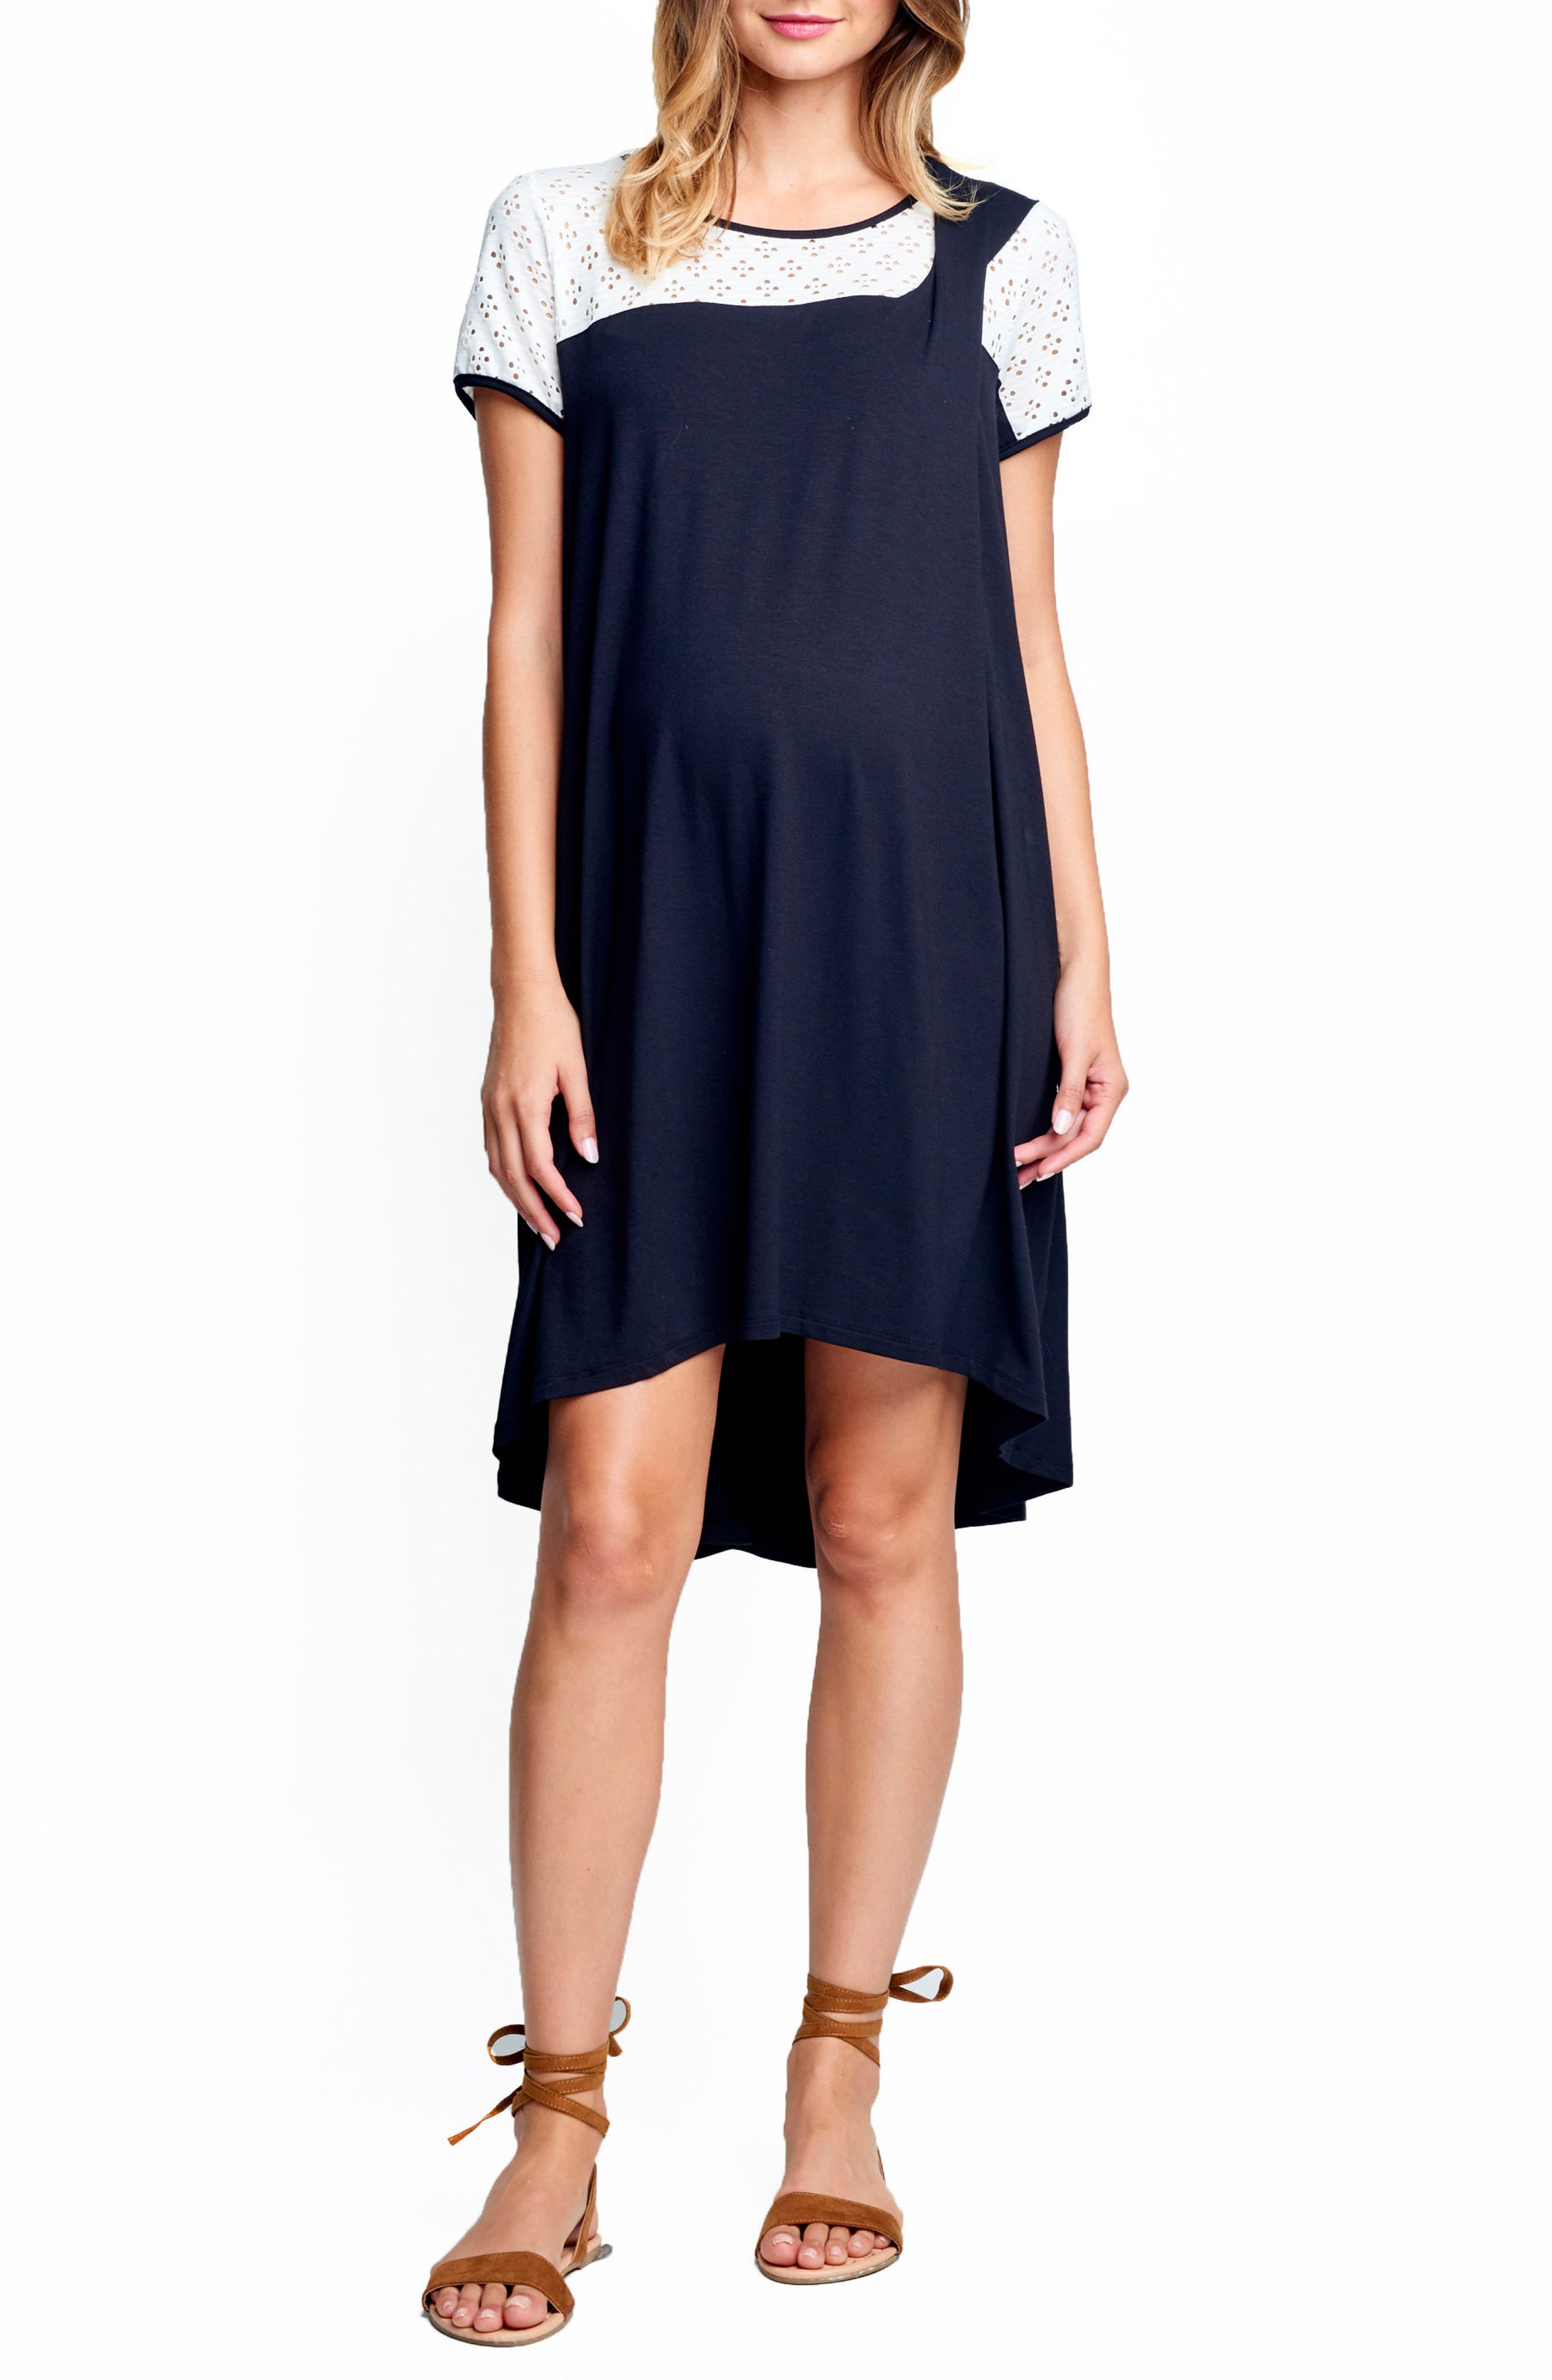 MATERNAL AMERICA Drape High/Low Maternity Dress, Main, color, 100